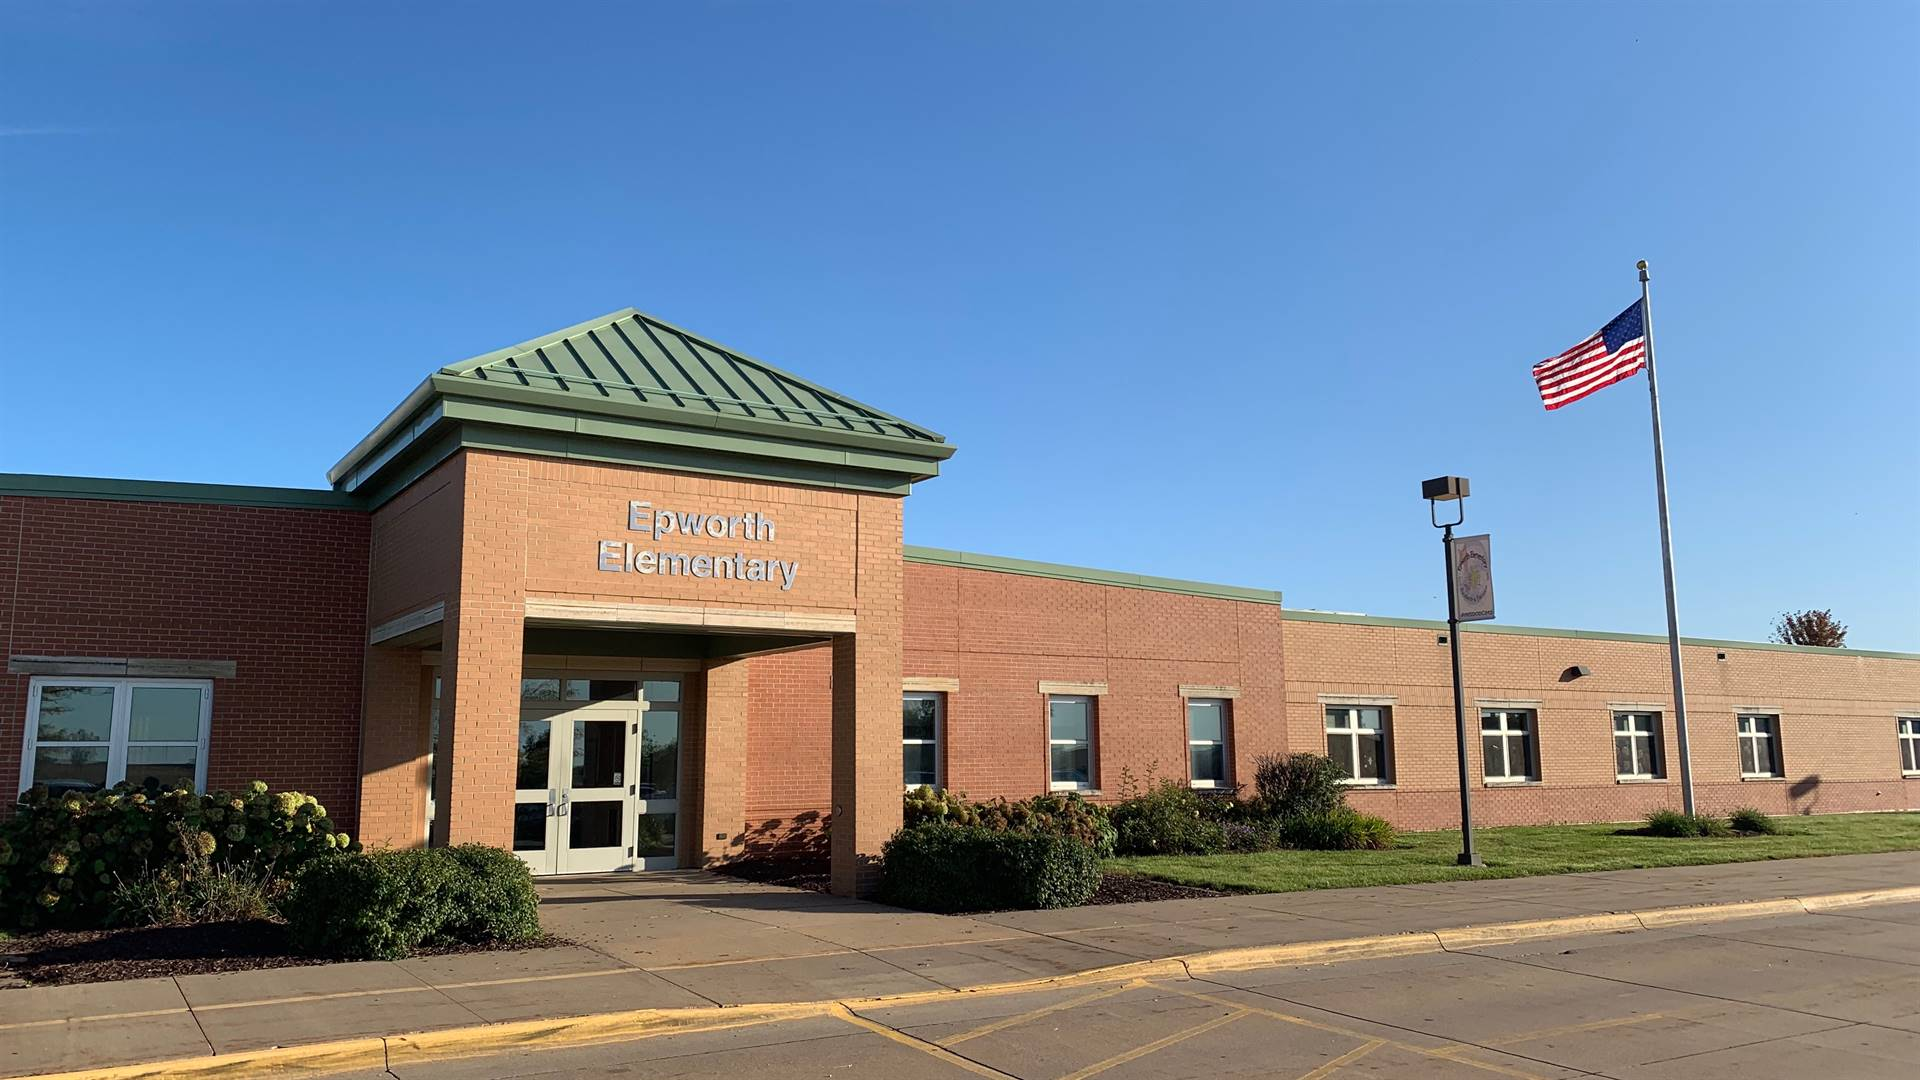 Epworth Elementary School